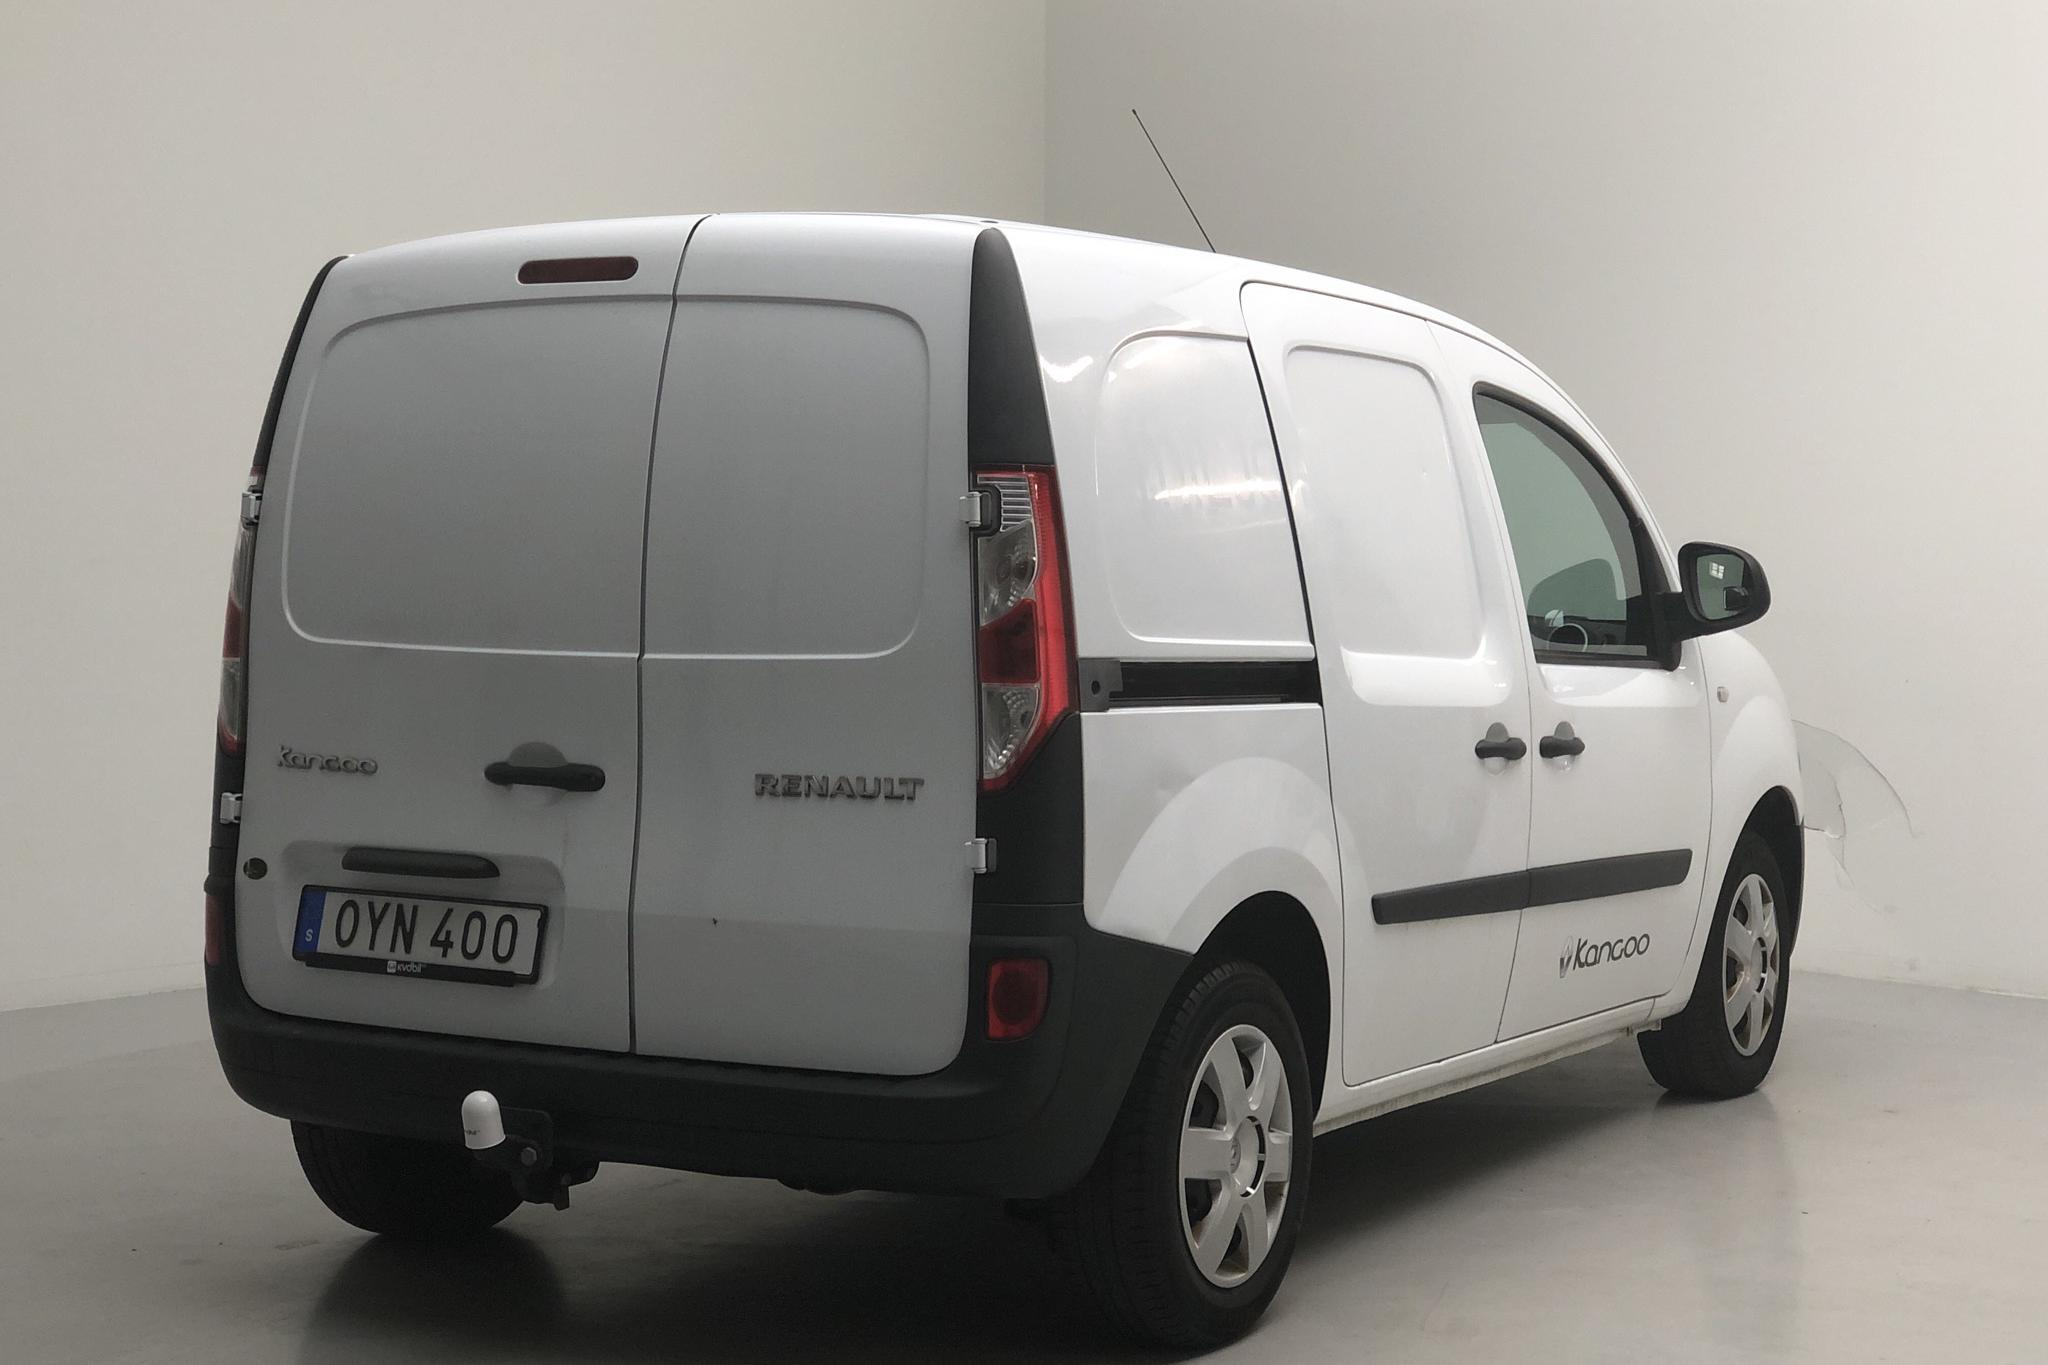 Renault Kangoo 1.5 dCi Skåp (75hk) - 145 930 km - Manual - white - 2016